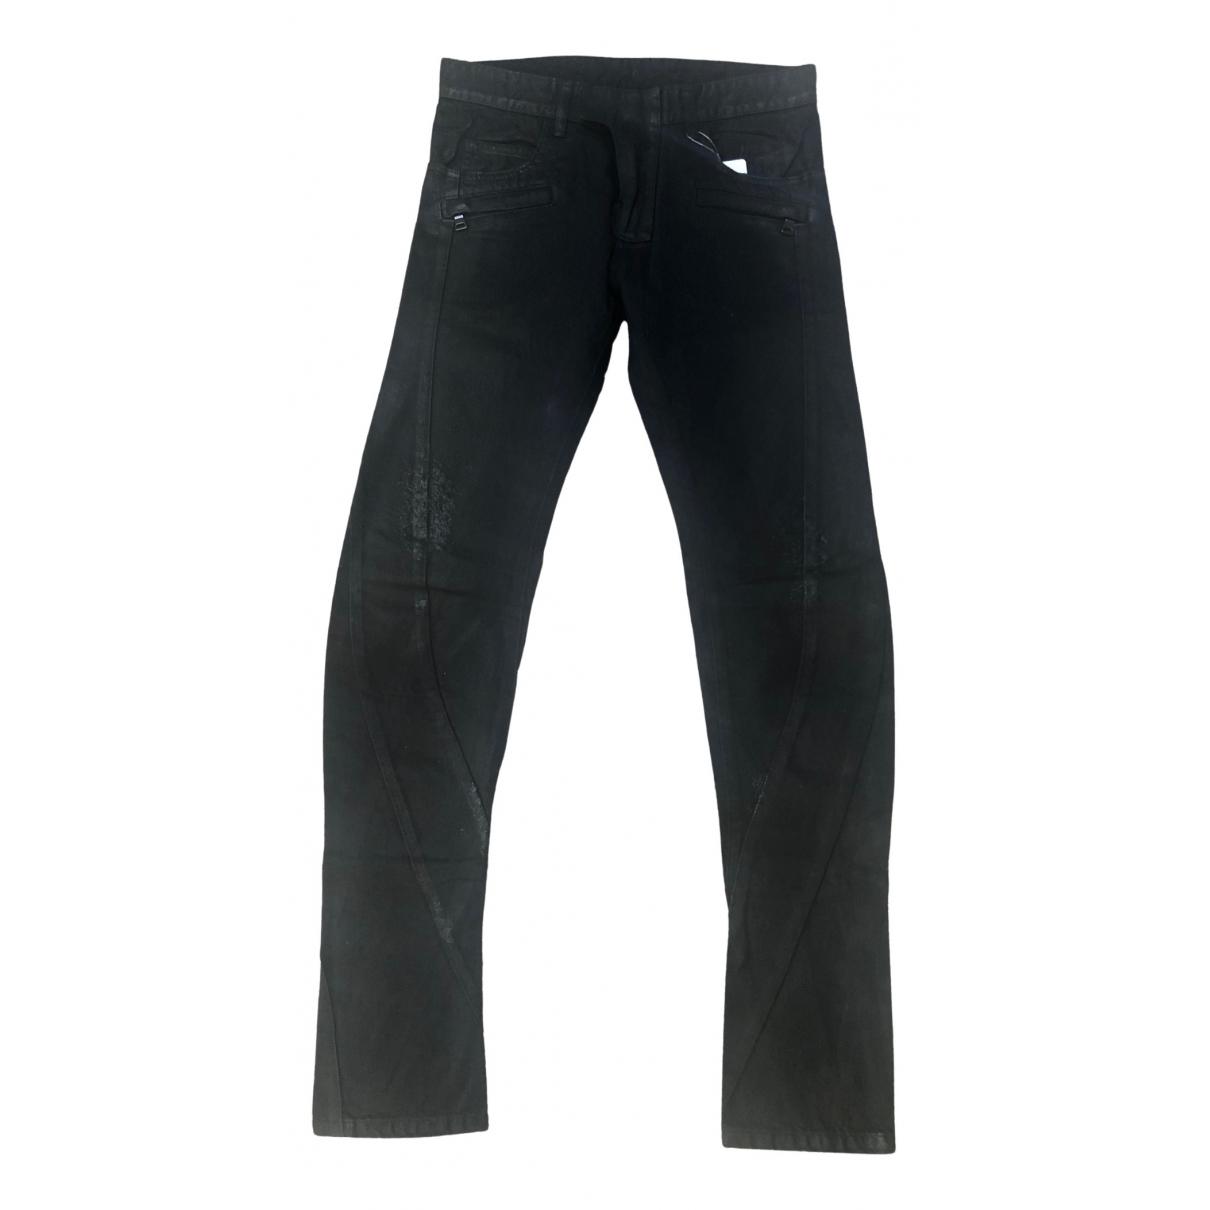 Balmain \N Black Cotton Jeans for Men 30 US